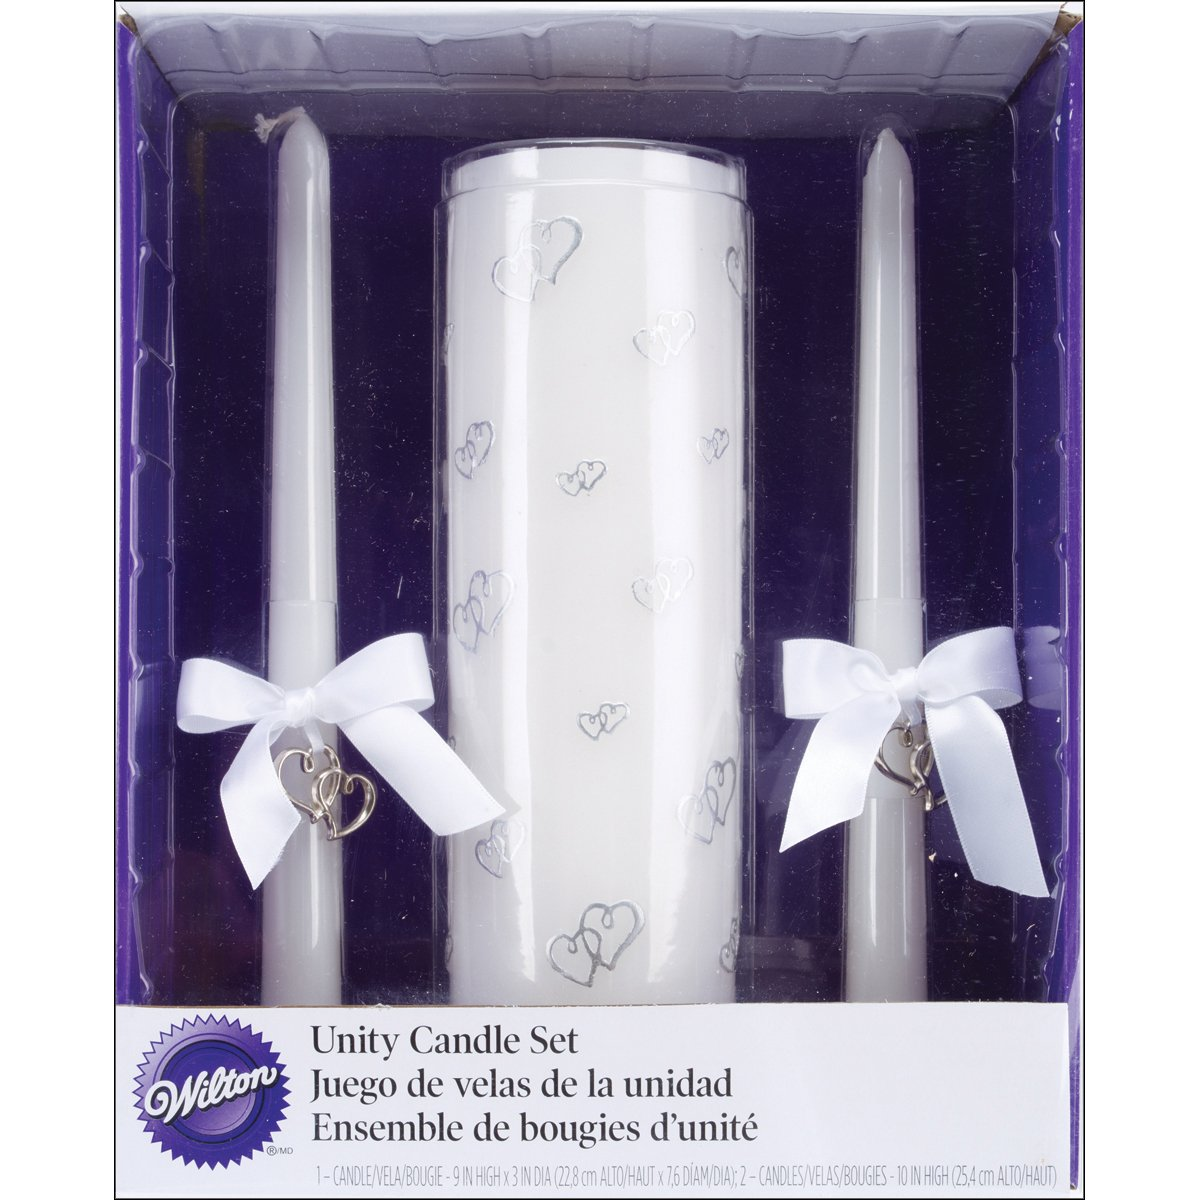 Wilton 120-464 Sweetheart Unity Candle Set